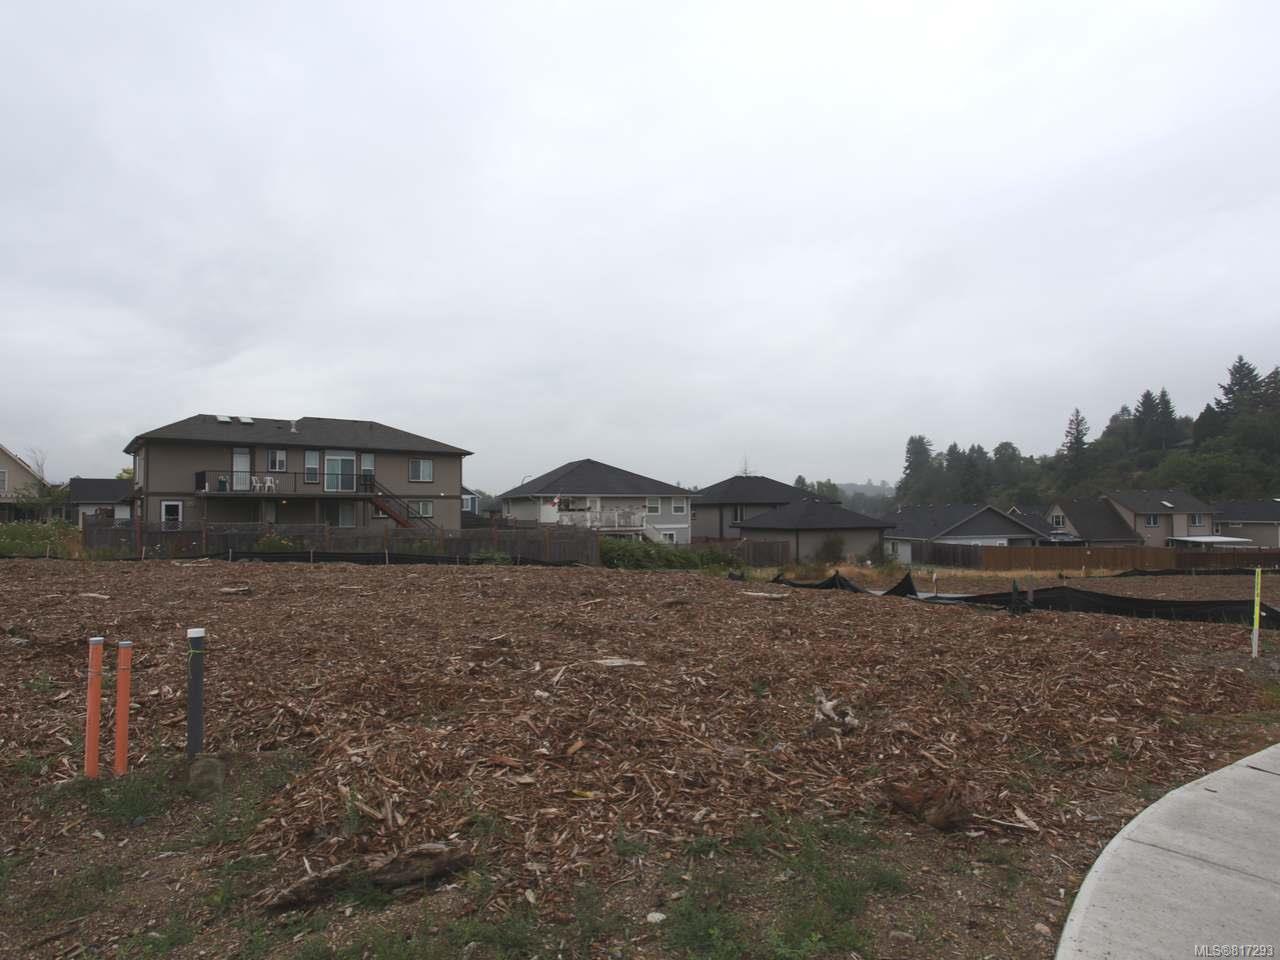 Main Photo: 573 Menzies Ridge Dr in NANAIMO: Na University District Land for sale (Nanaimo)  : MLS®# 817293